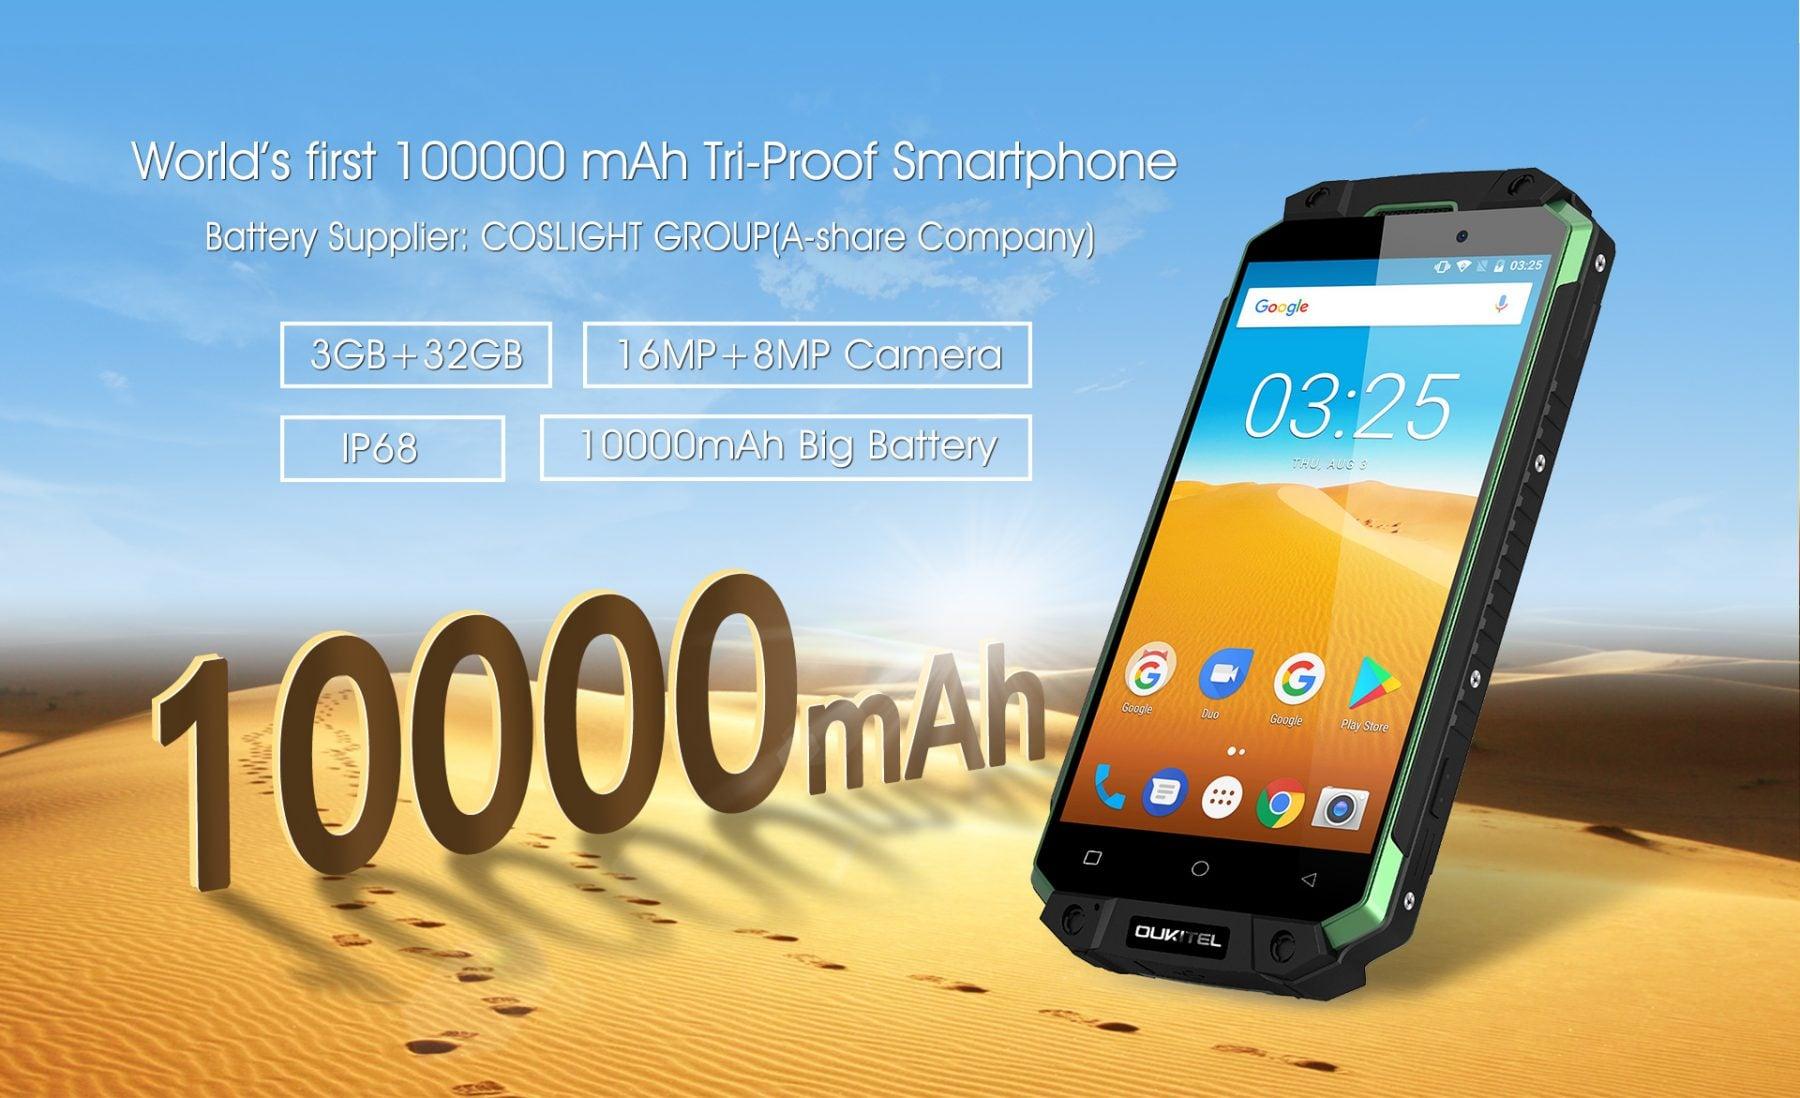 K10000 MAX 10000mAh battery from COSLIGHT